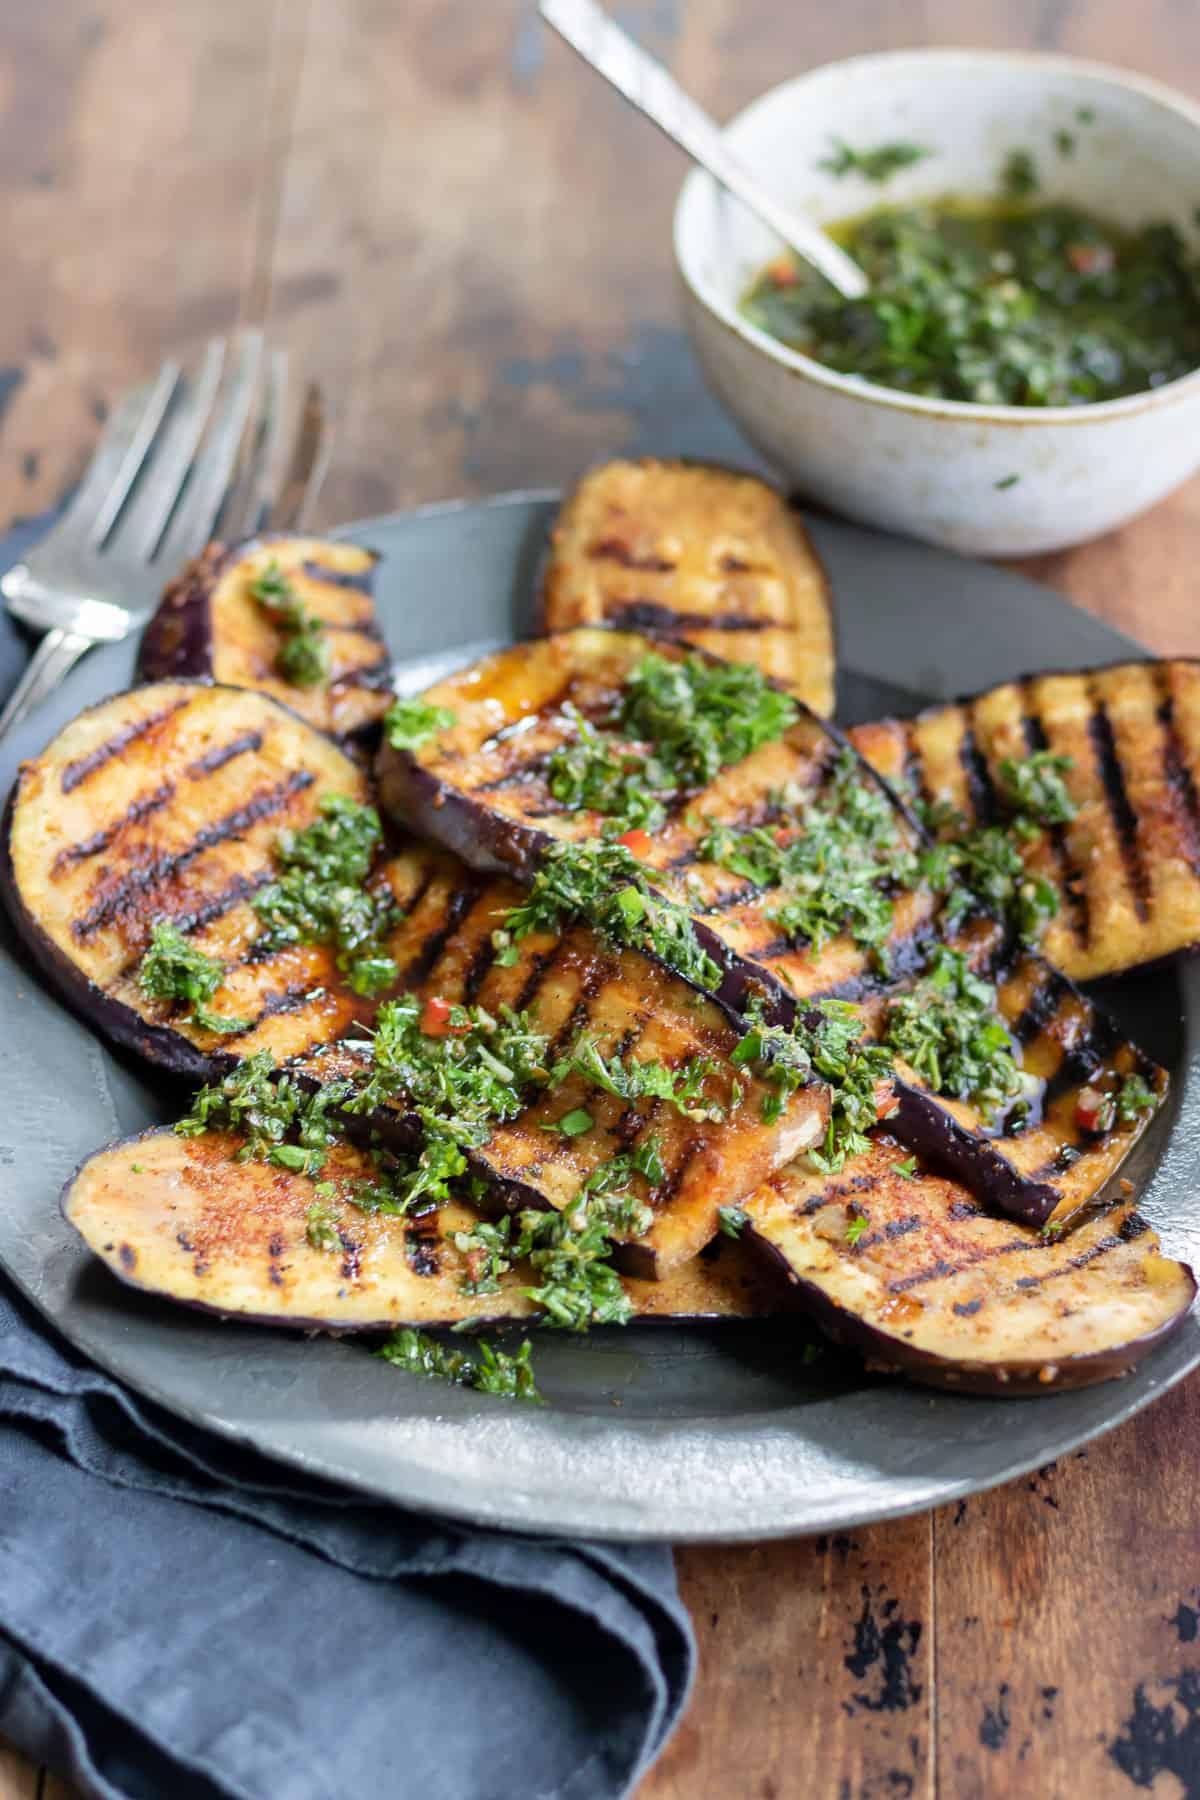 Eggplant steaks with carrot greens chimichurri.